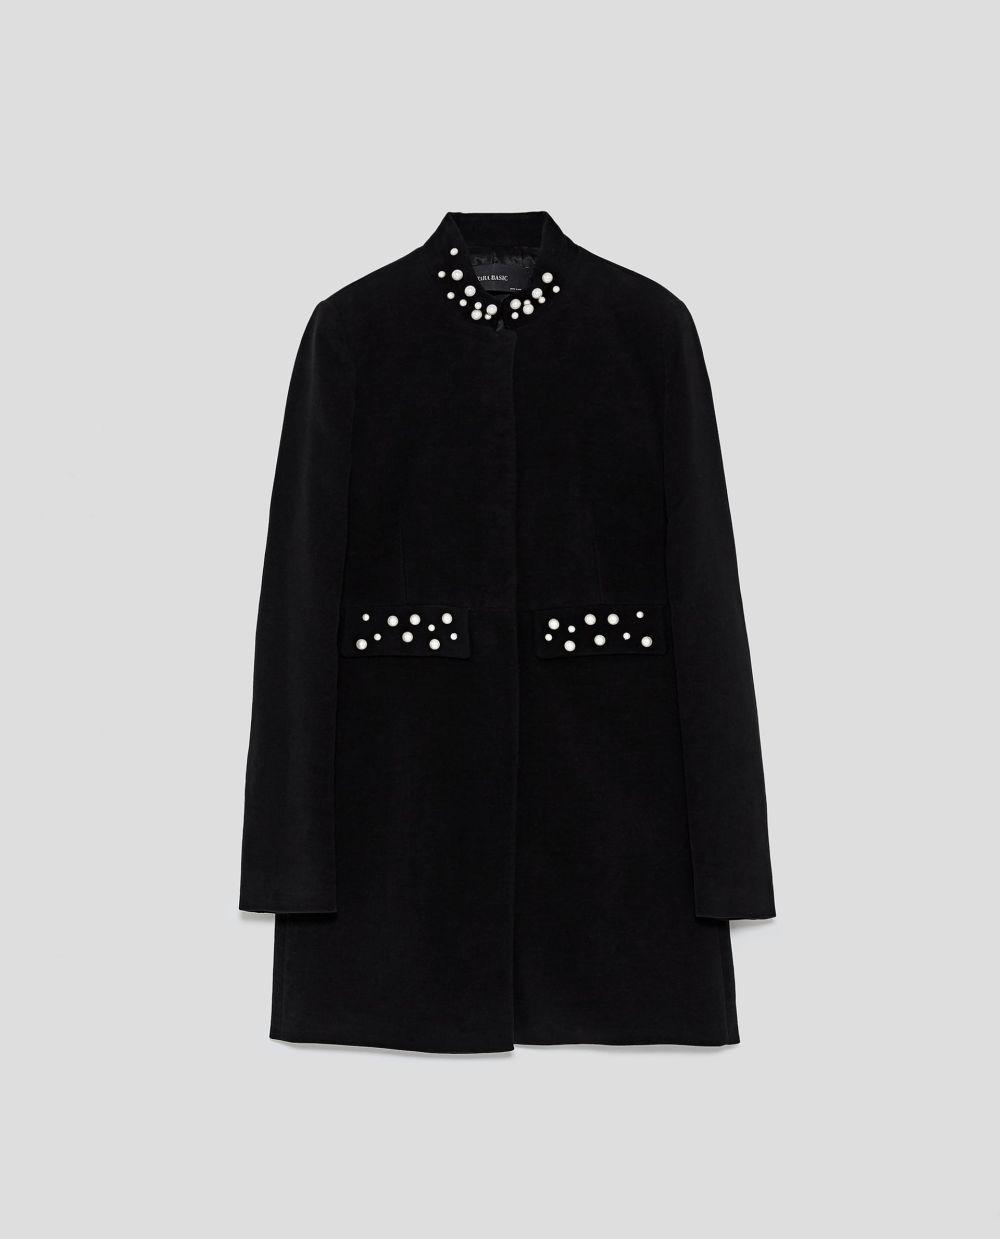 Levita negra con perlas de Zara (49,95 euros)